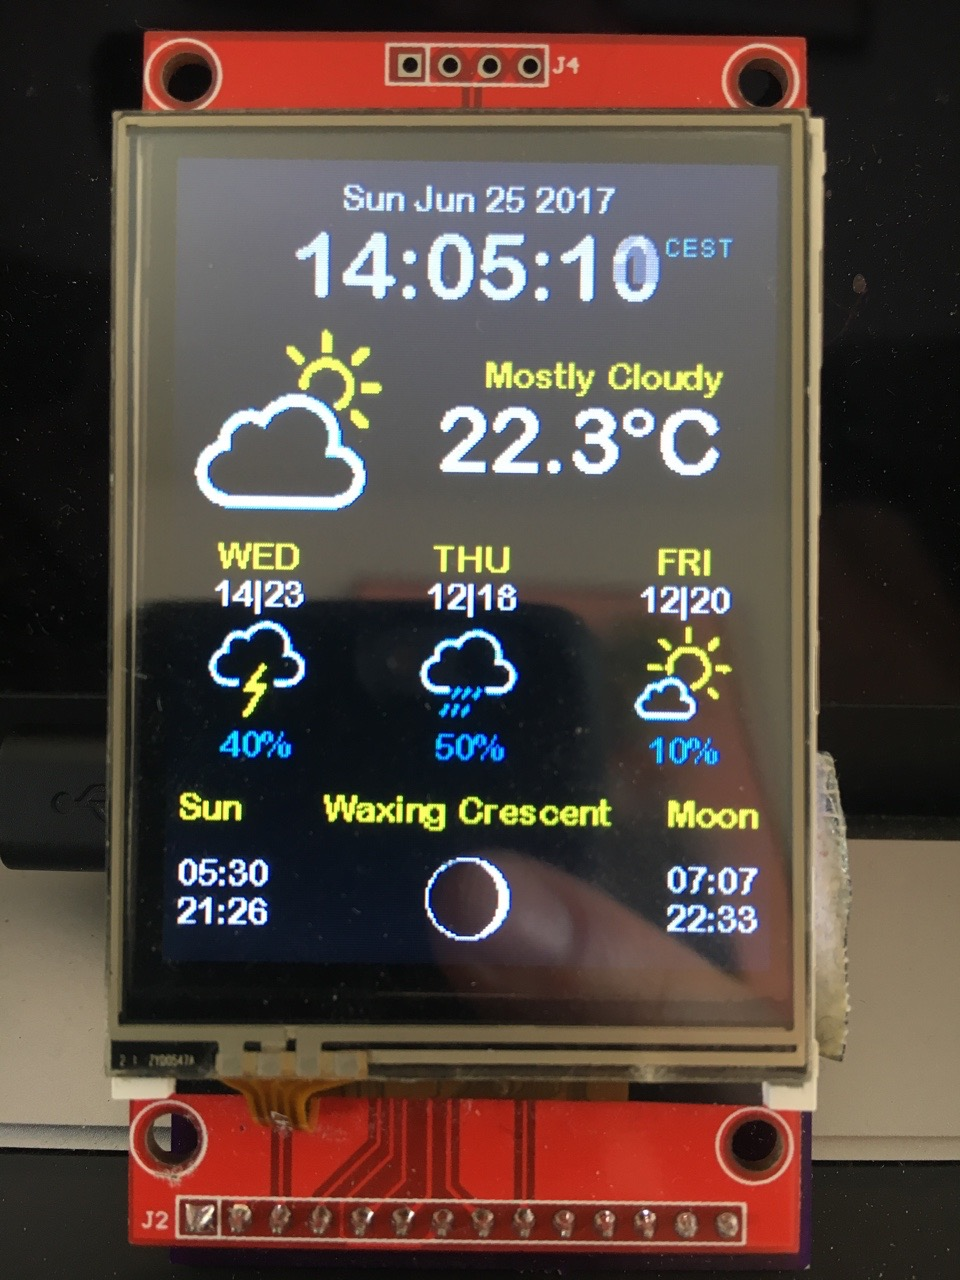 New WeatherStation Color Version published - Squix - TechBlog